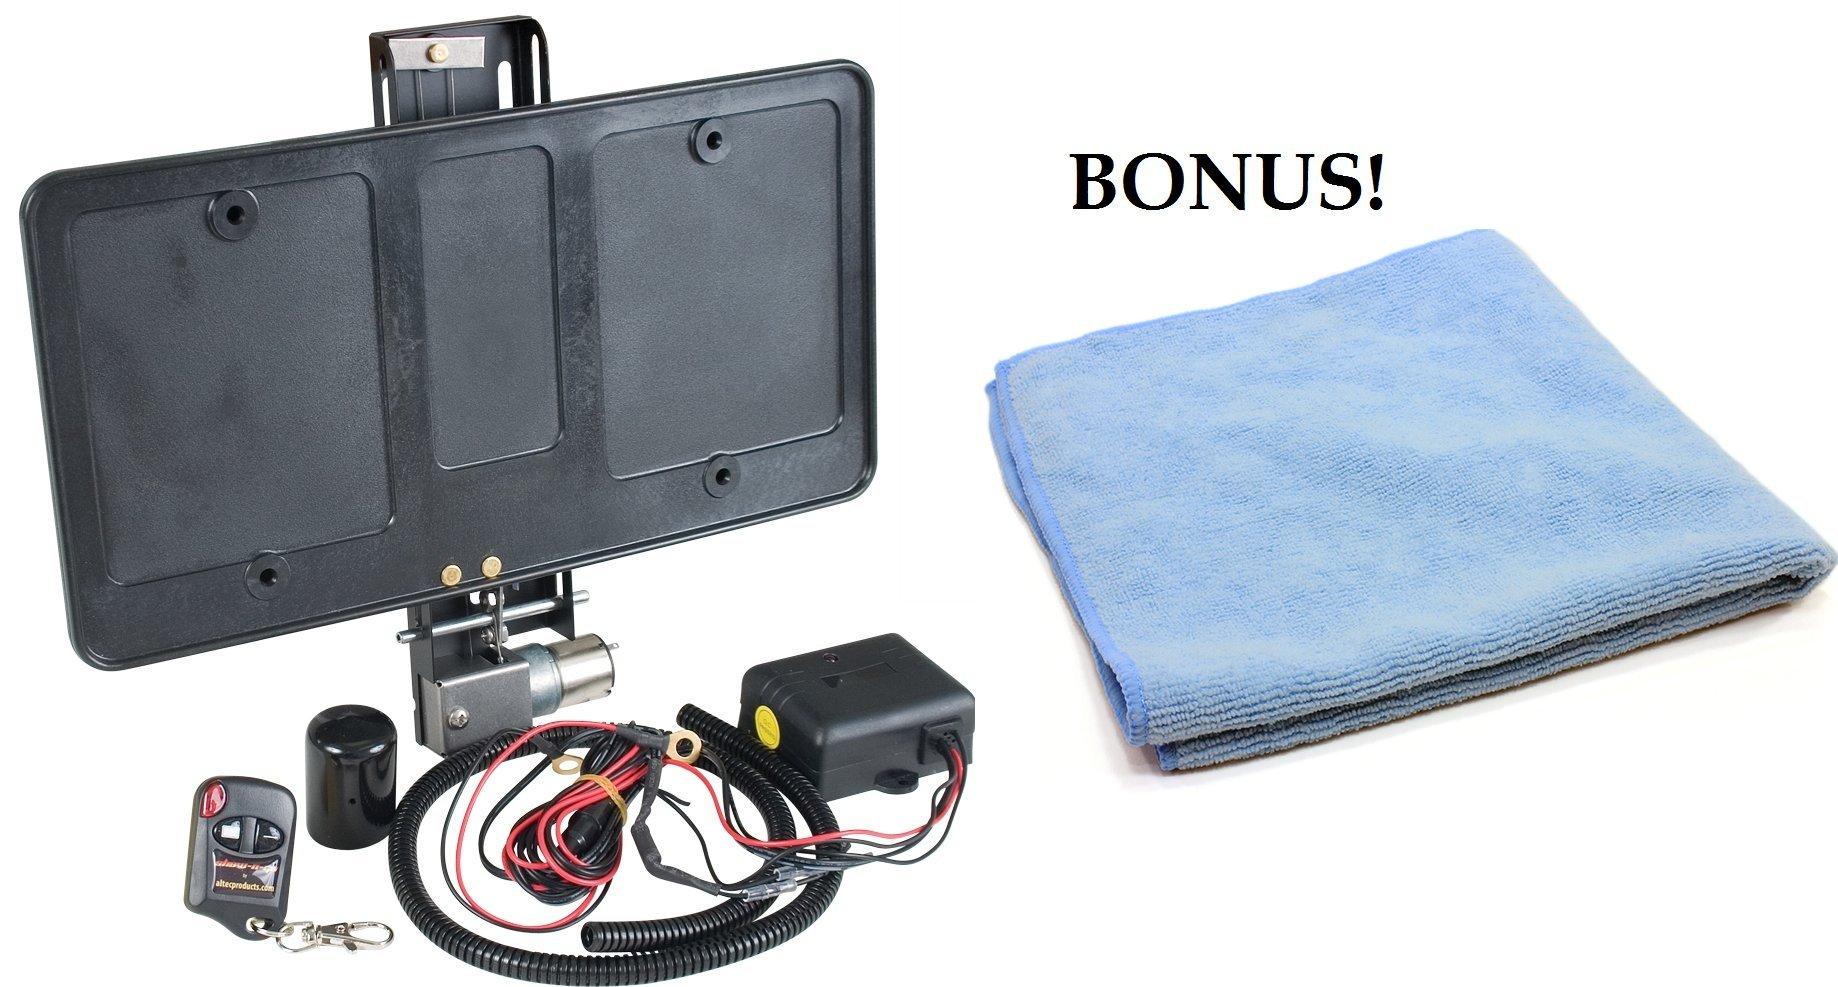 Show N Go Electric Powered License Plate Frame w/ BONUS Microfiber Towel